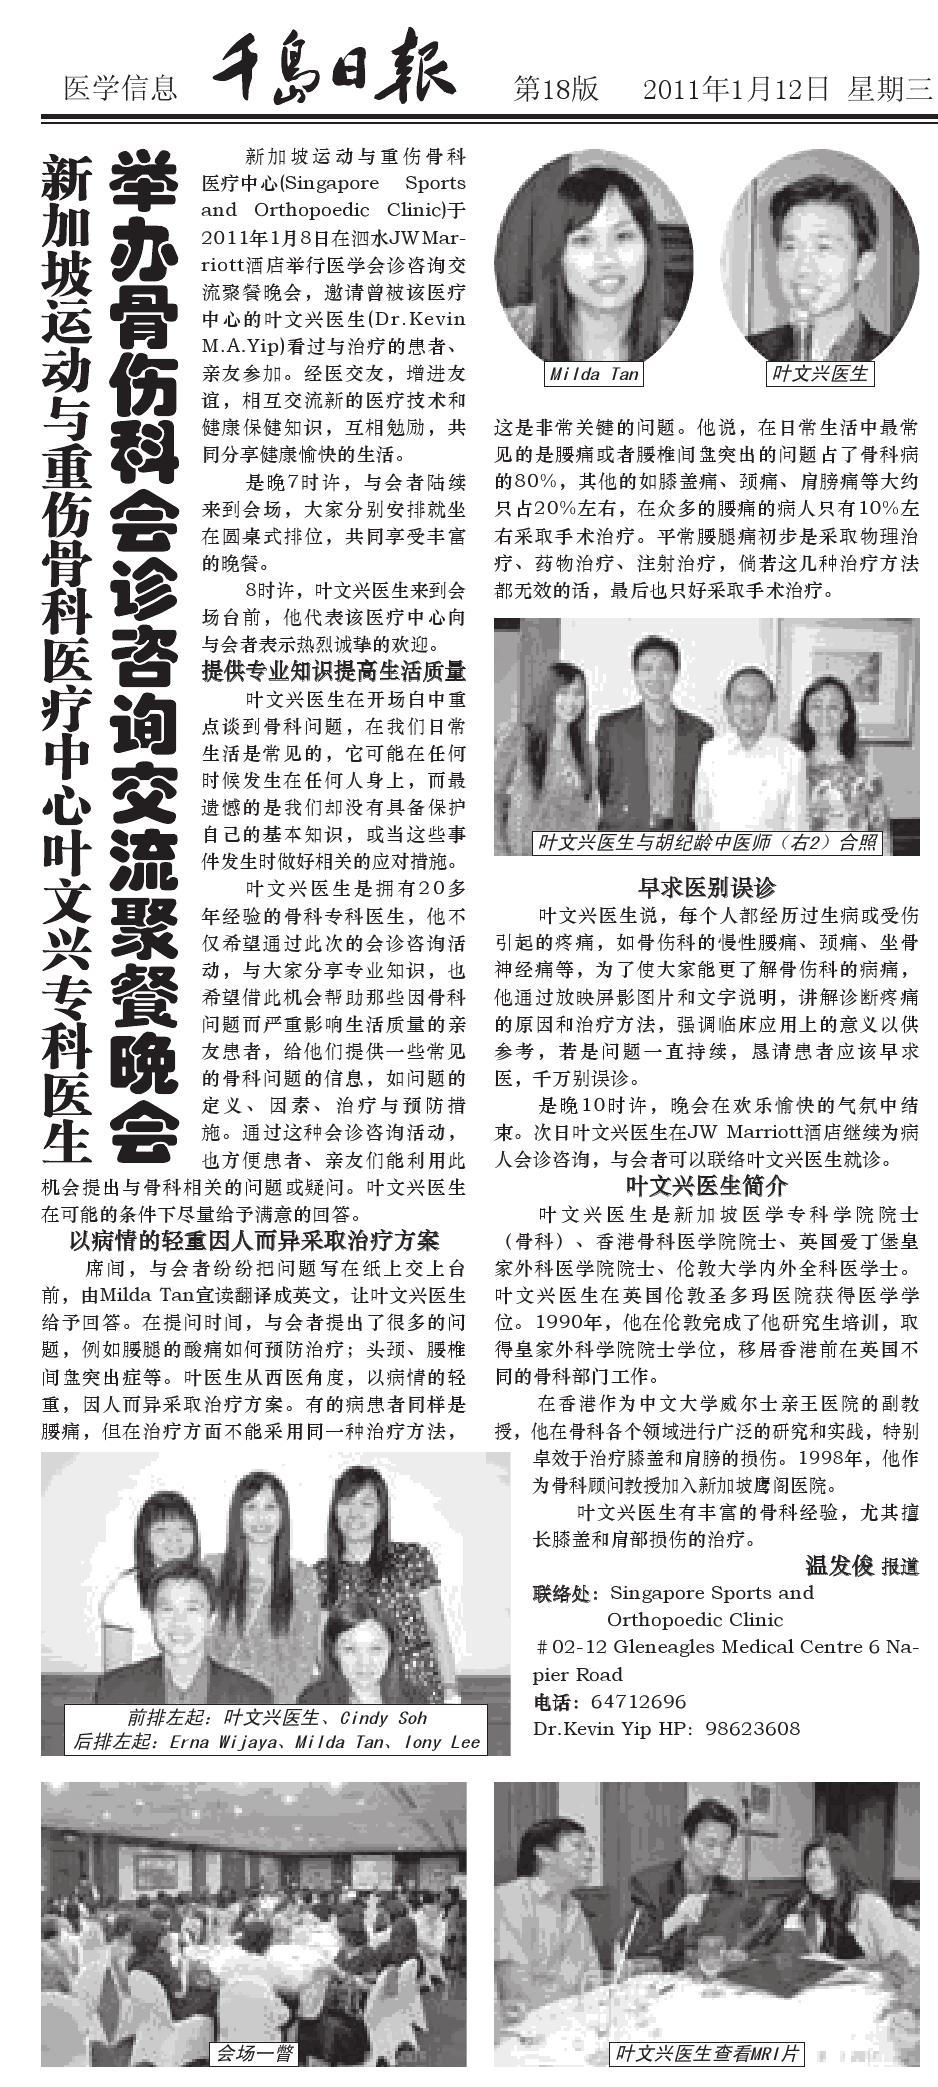 Surabaya newspaper article